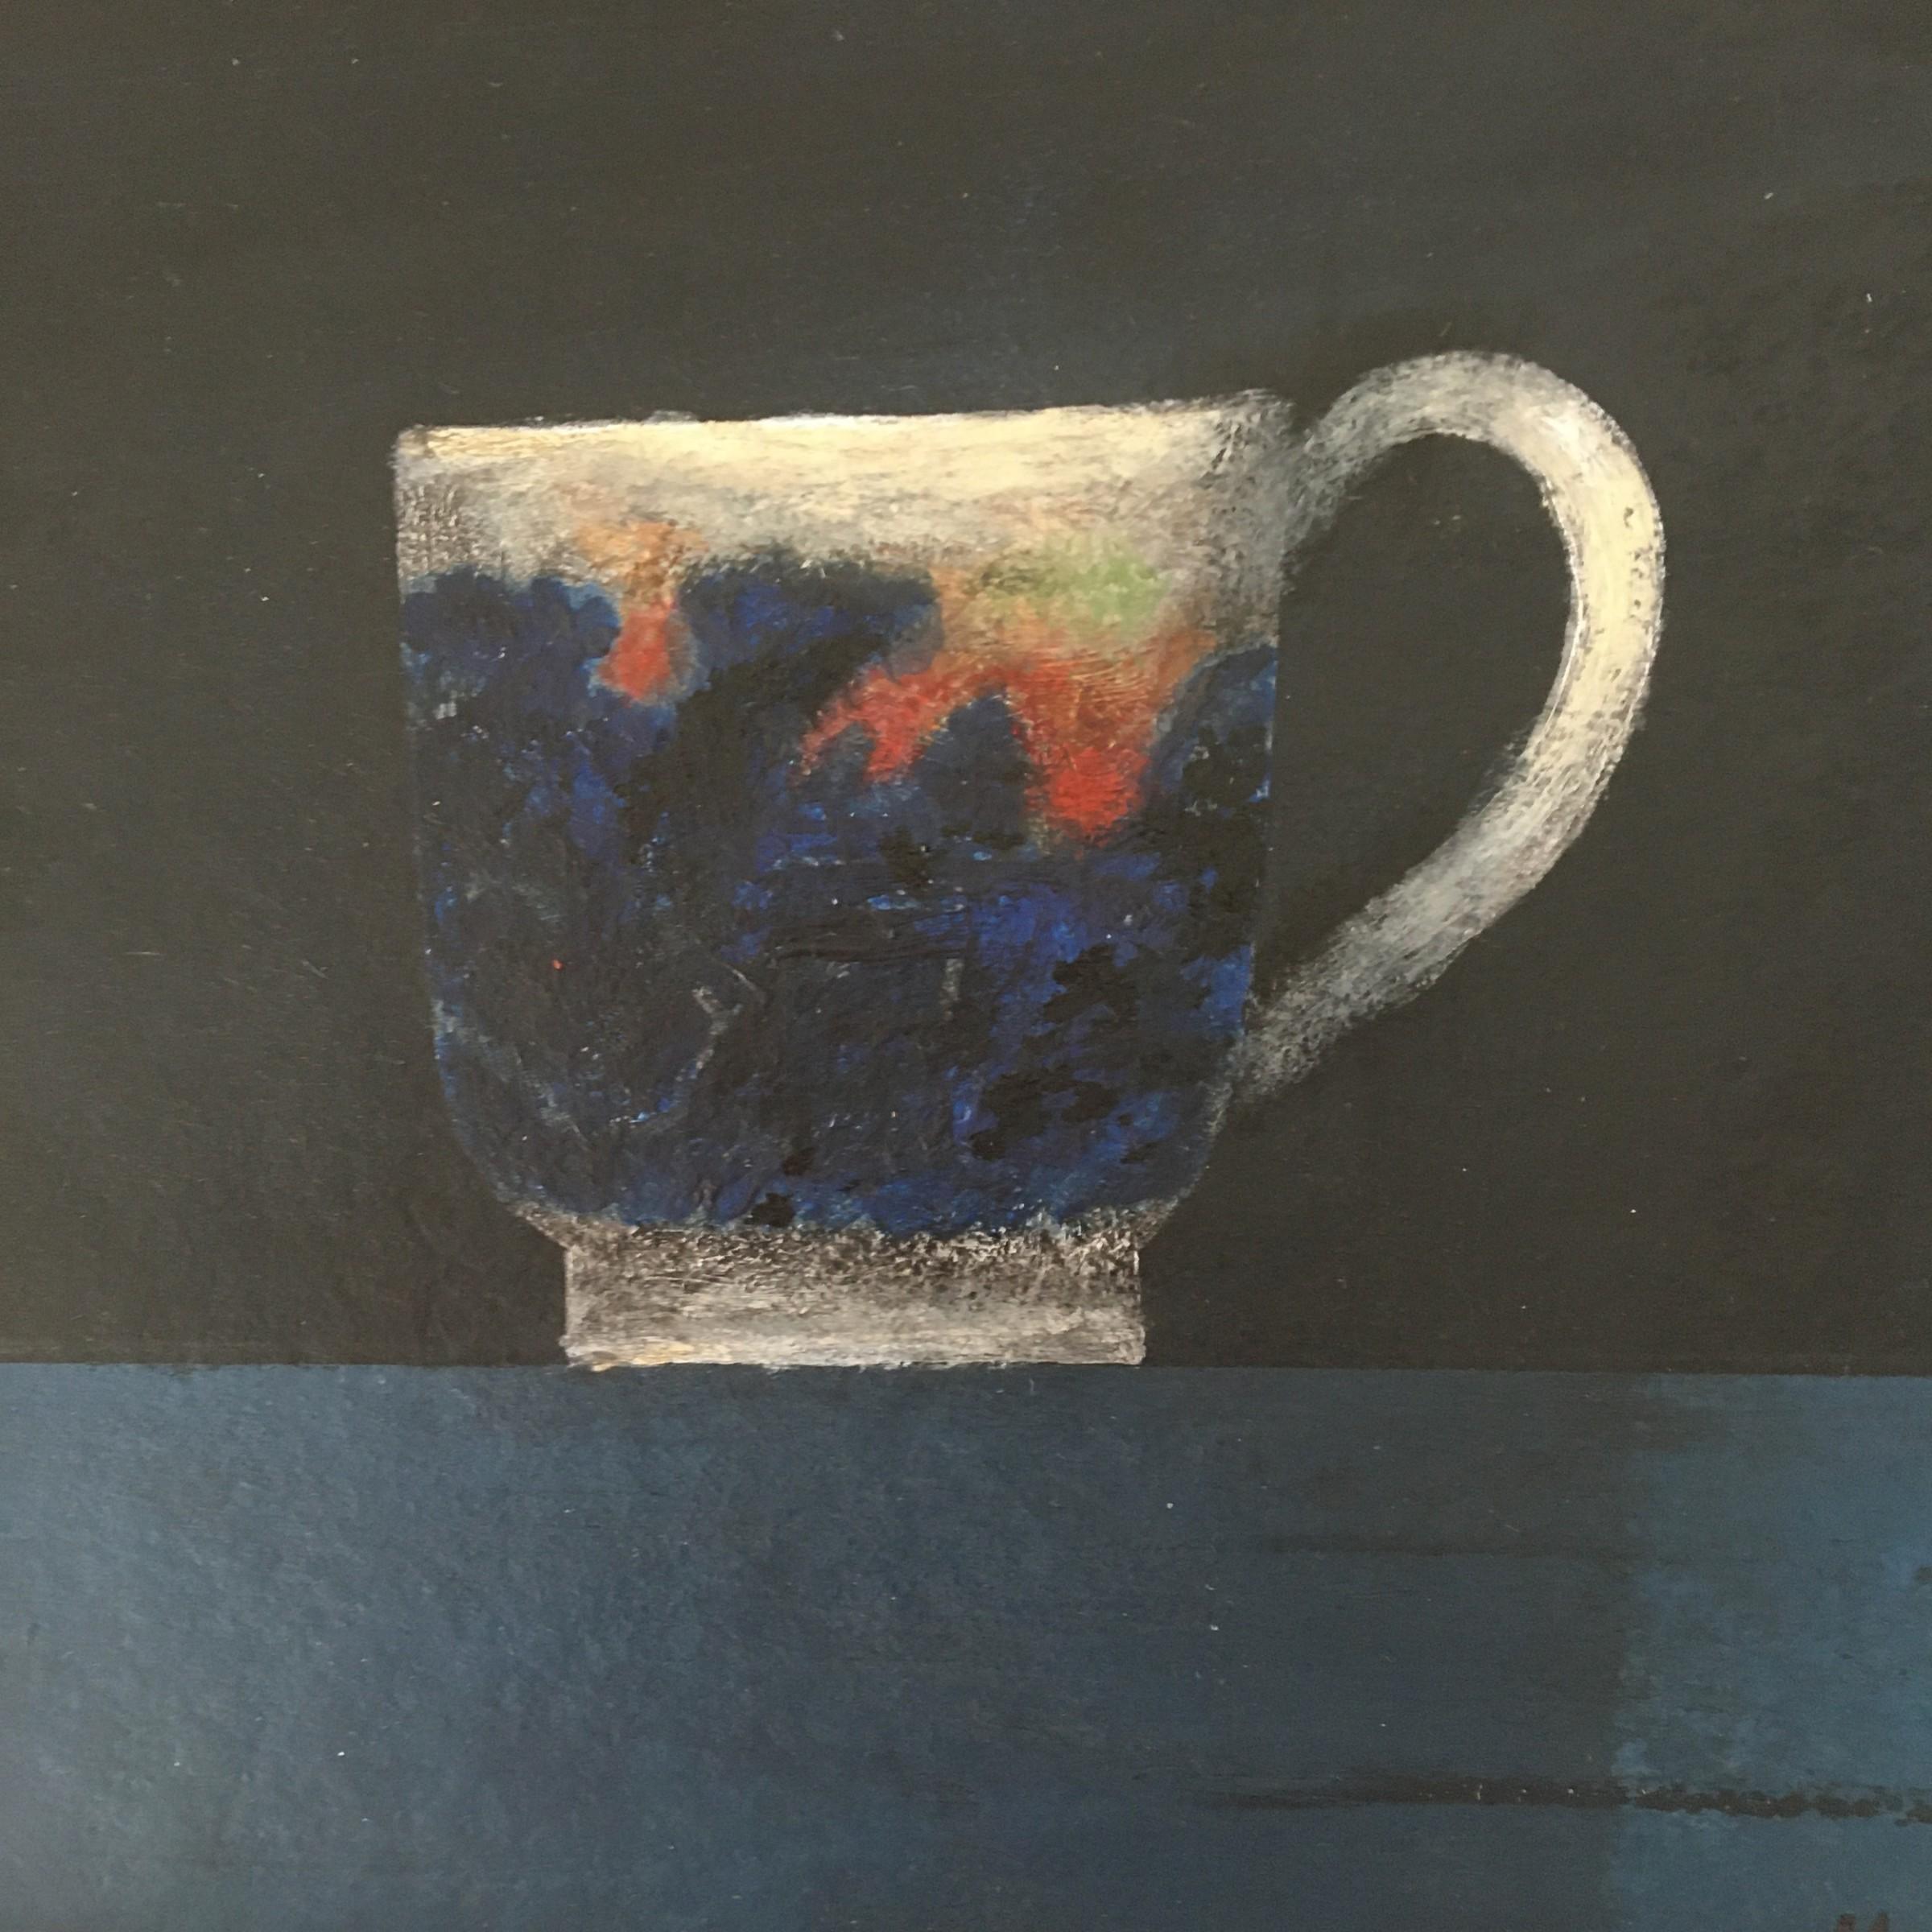 "<span class=""link fancybox-details-link""><a href=""/artists/78-martin-leman/works/12079-martin-leman-night-cup/"">View Detail Page</a></span><div class=""artist""><span class=""artist""><strong>Martin Leman</strong></span></div><div class=""title""><em>Night Cup</em></div><div class=""medium"">acrylic on card</div><div class=""dimensions"">Frame: 31 x 31 cm<br /> Artwork: 15 x 15 cm</div><div class=""price"">£450.00</div>"